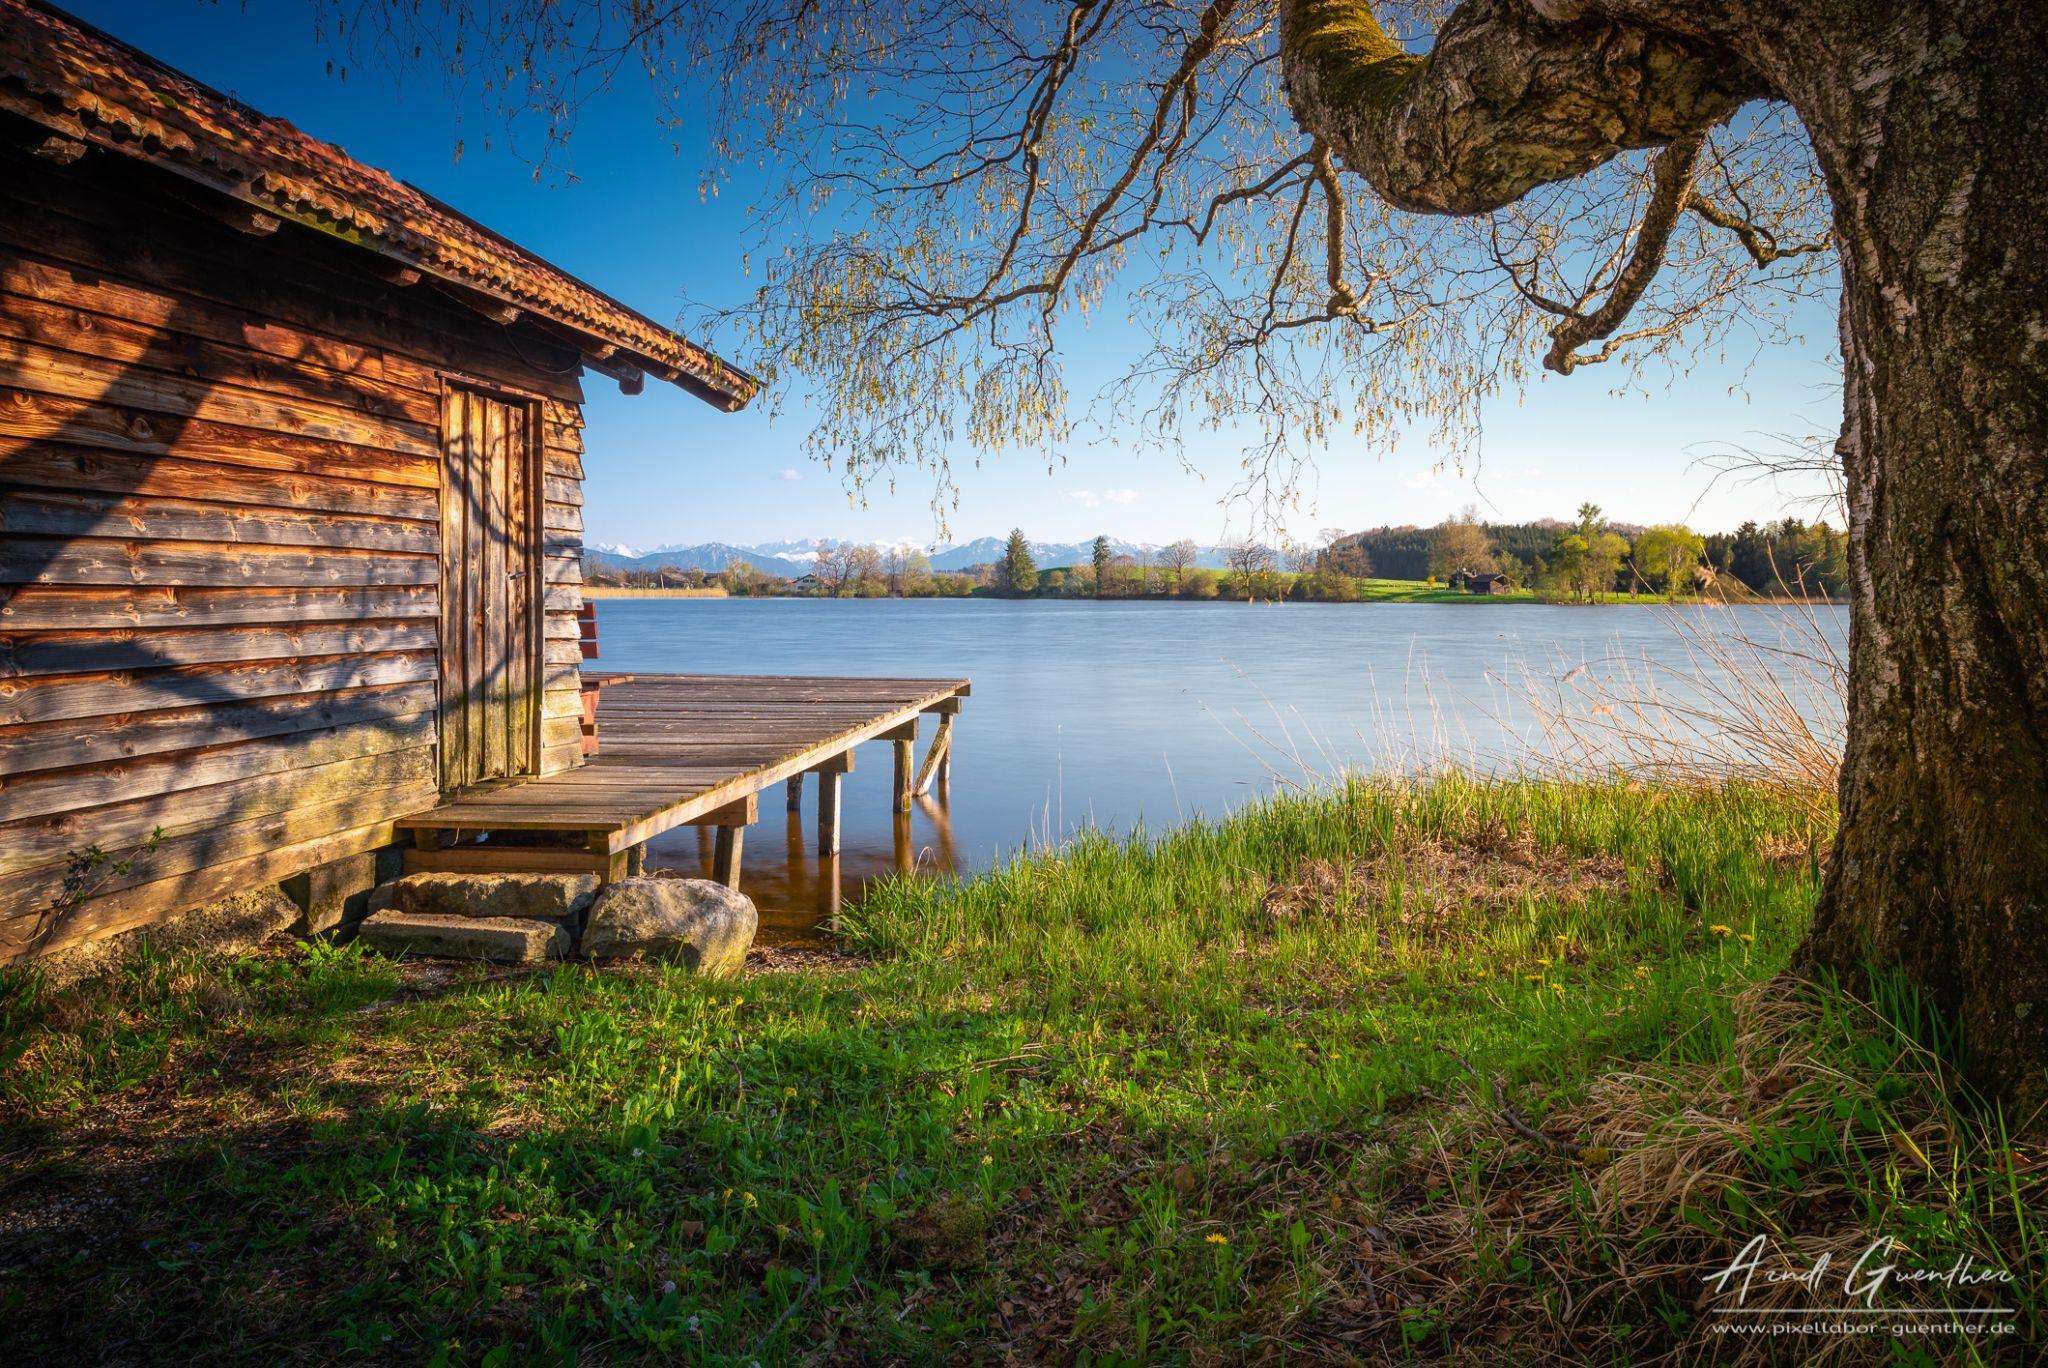 Nussberg Pond, Germany